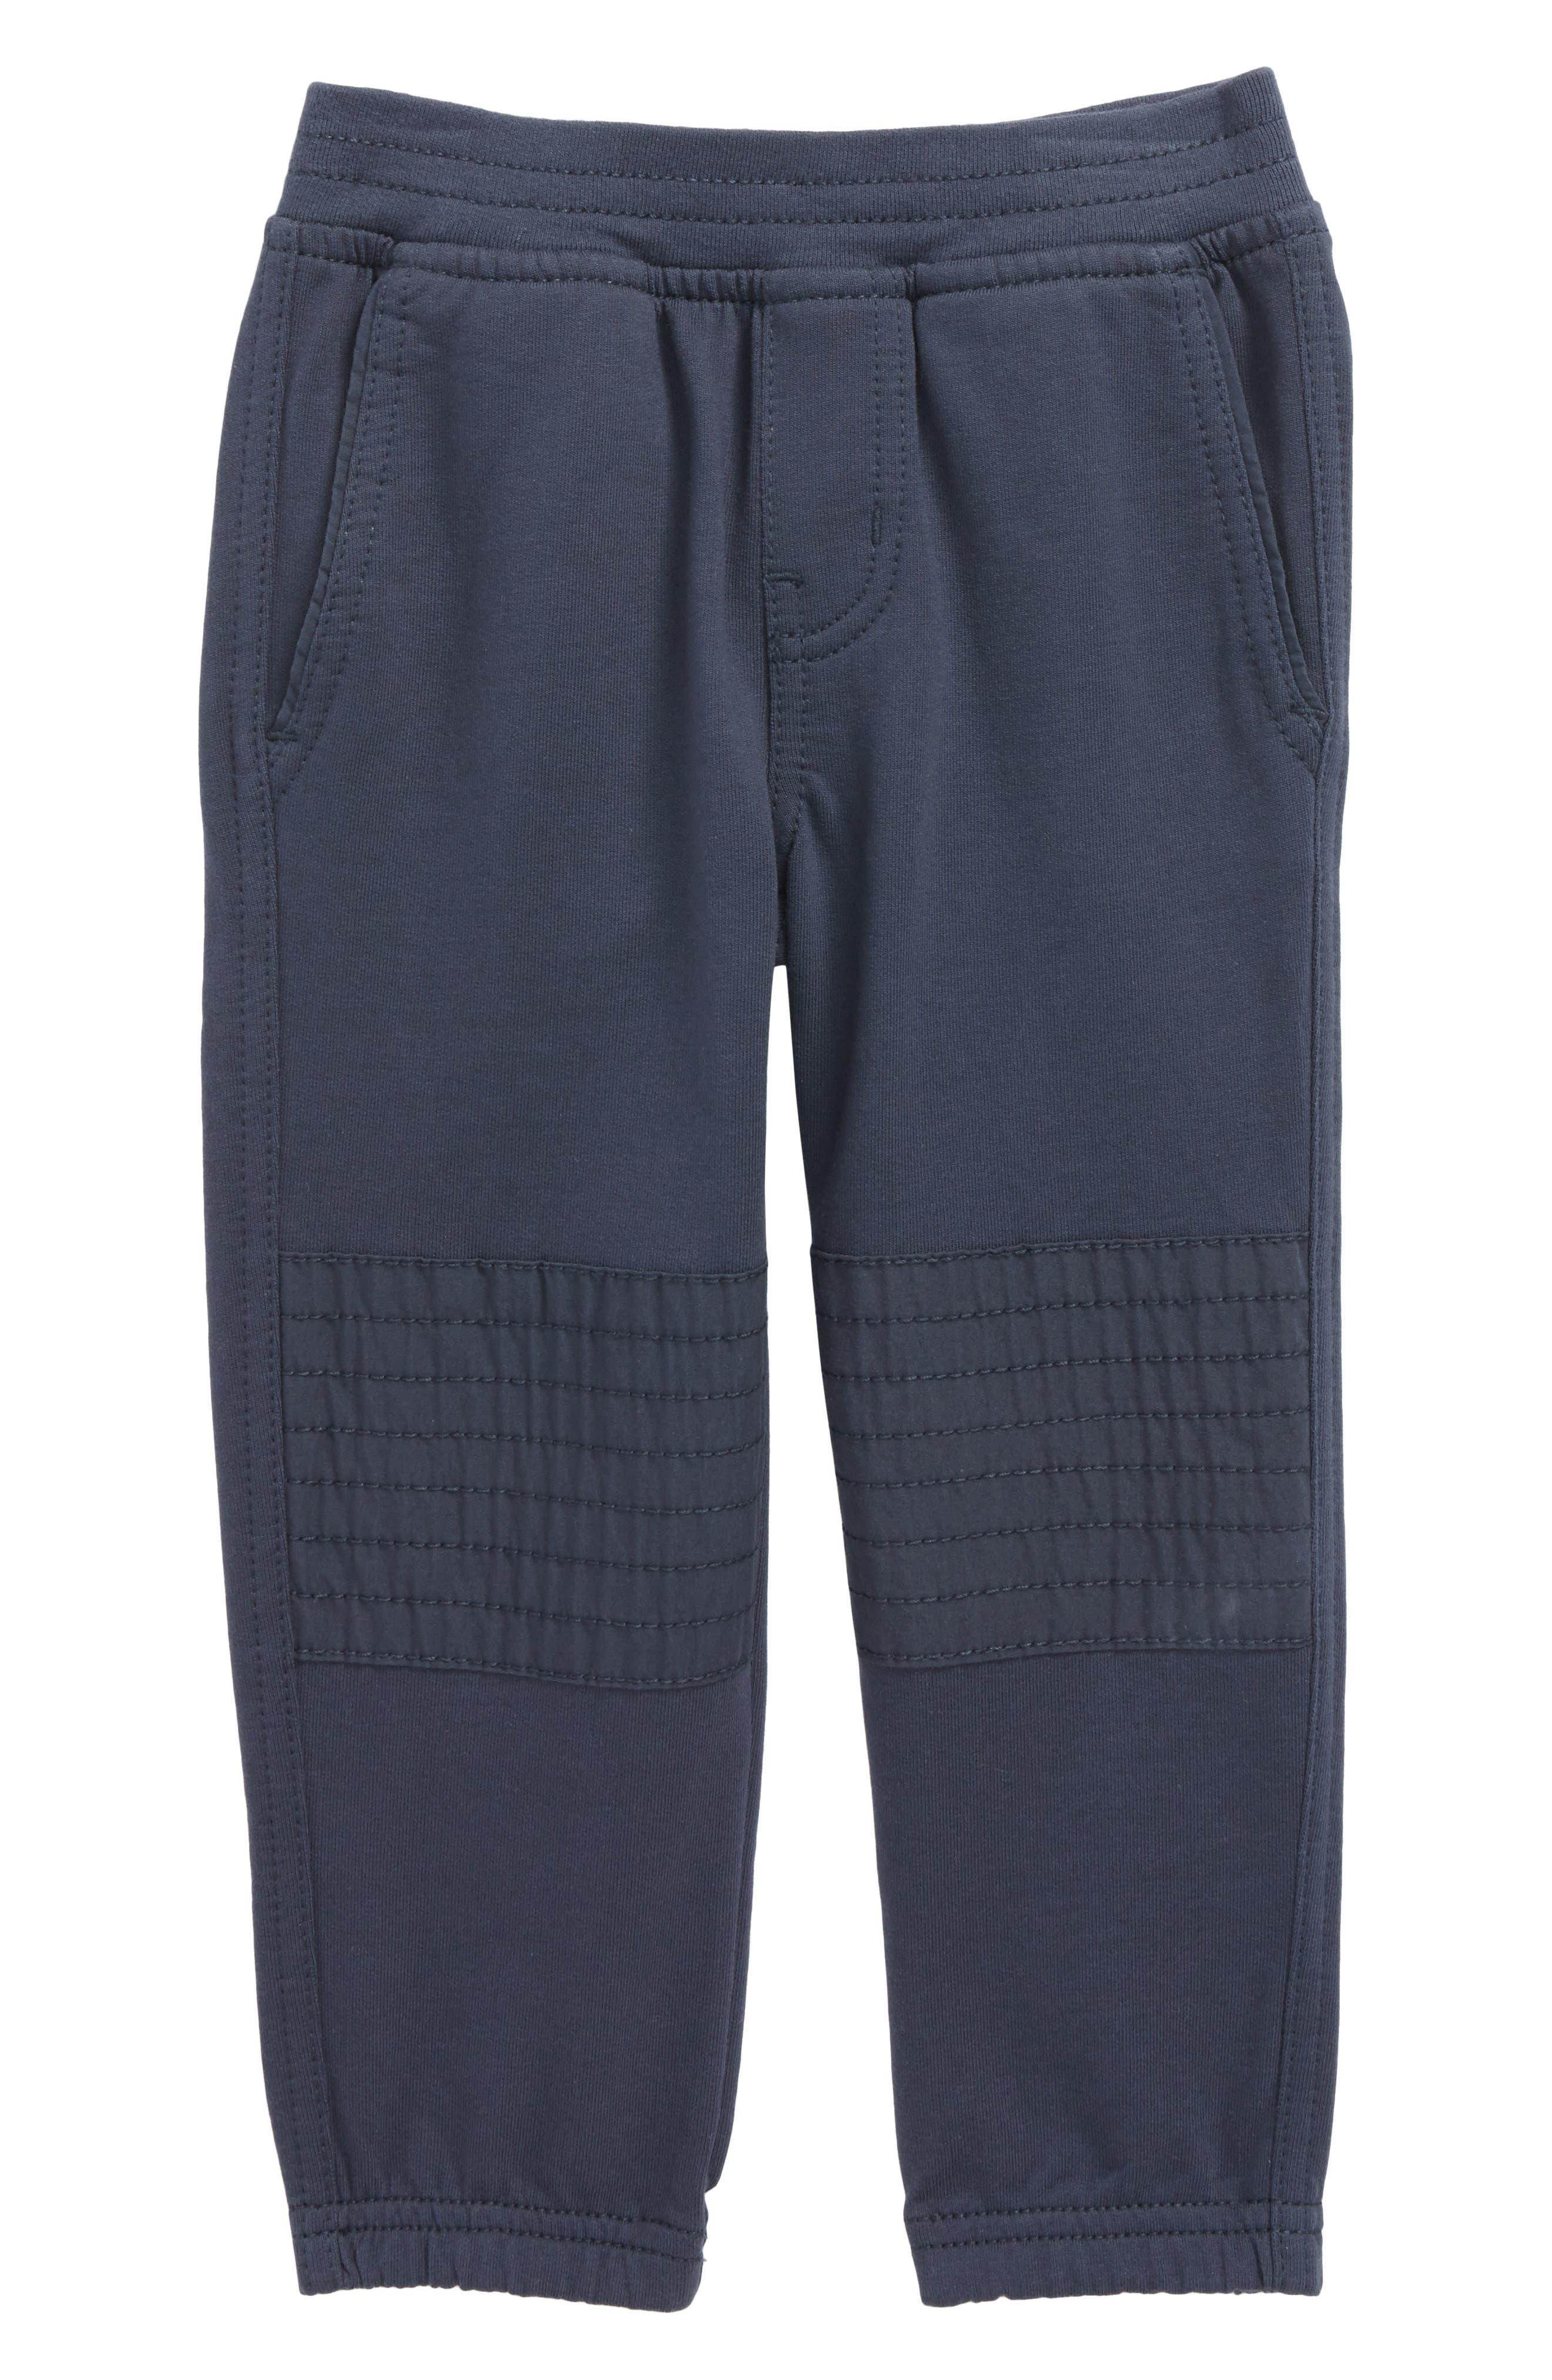 French Terry Moto Pants,                             Main thumbnail 1, color,                             Indigo